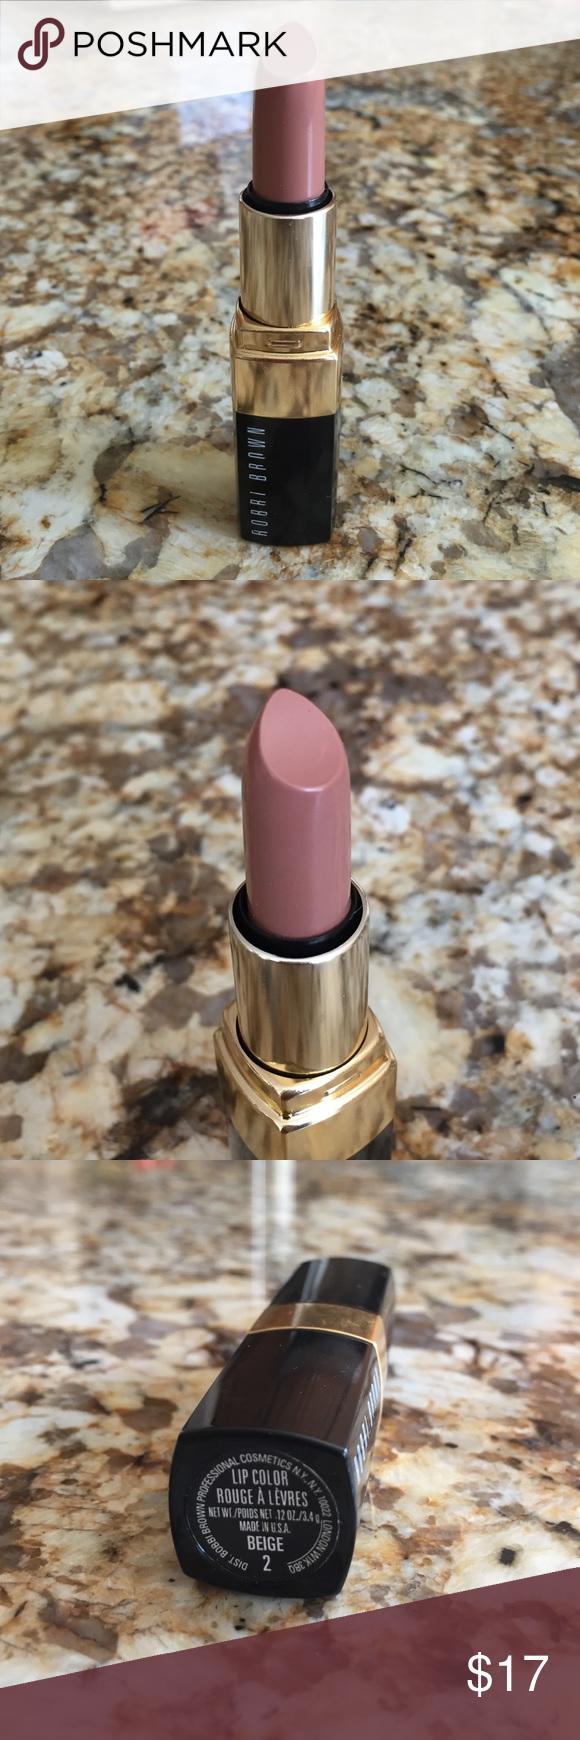 New Bobbi brown lipstick beige 2 Bobbi brown lipstick